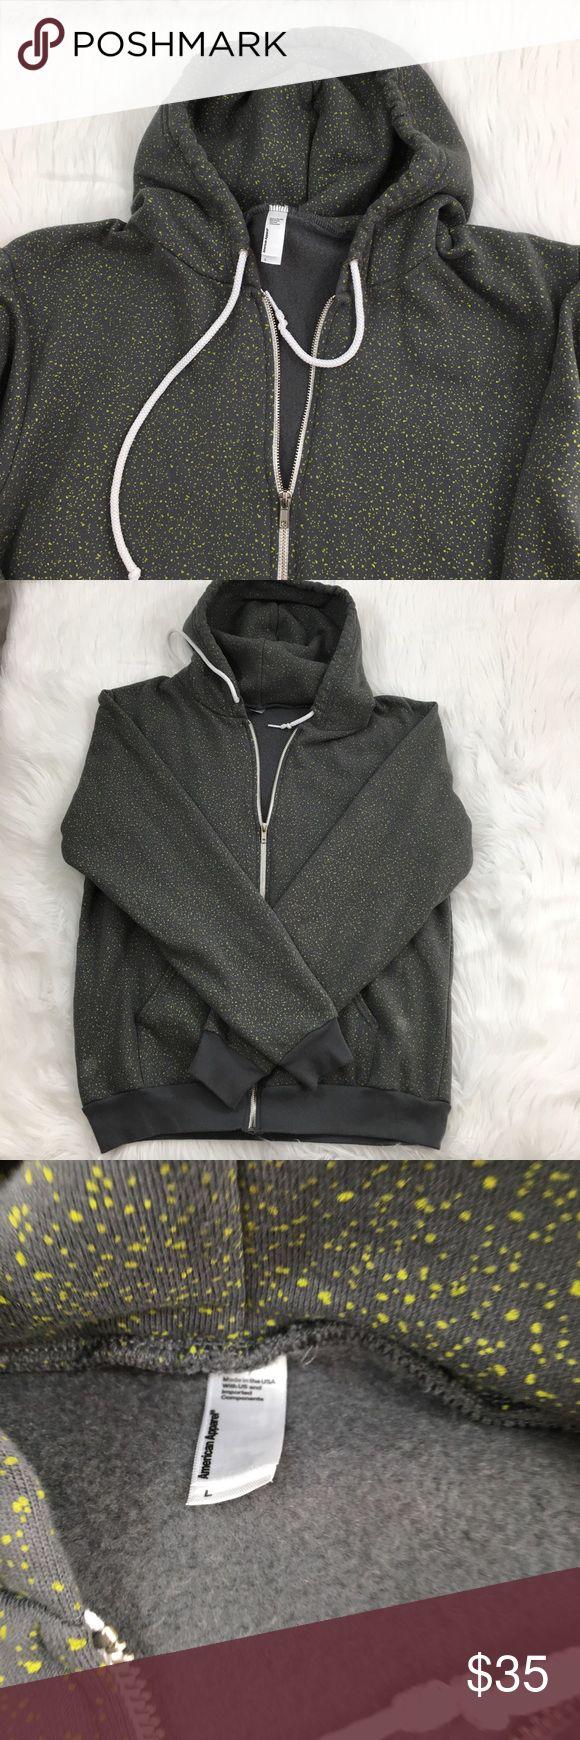 American Apparel Flex Fleece Hoodie New without tags. Unisex hoodie from American Apparel. It's very comfortable and warm. American Apparel Jackets & Coats